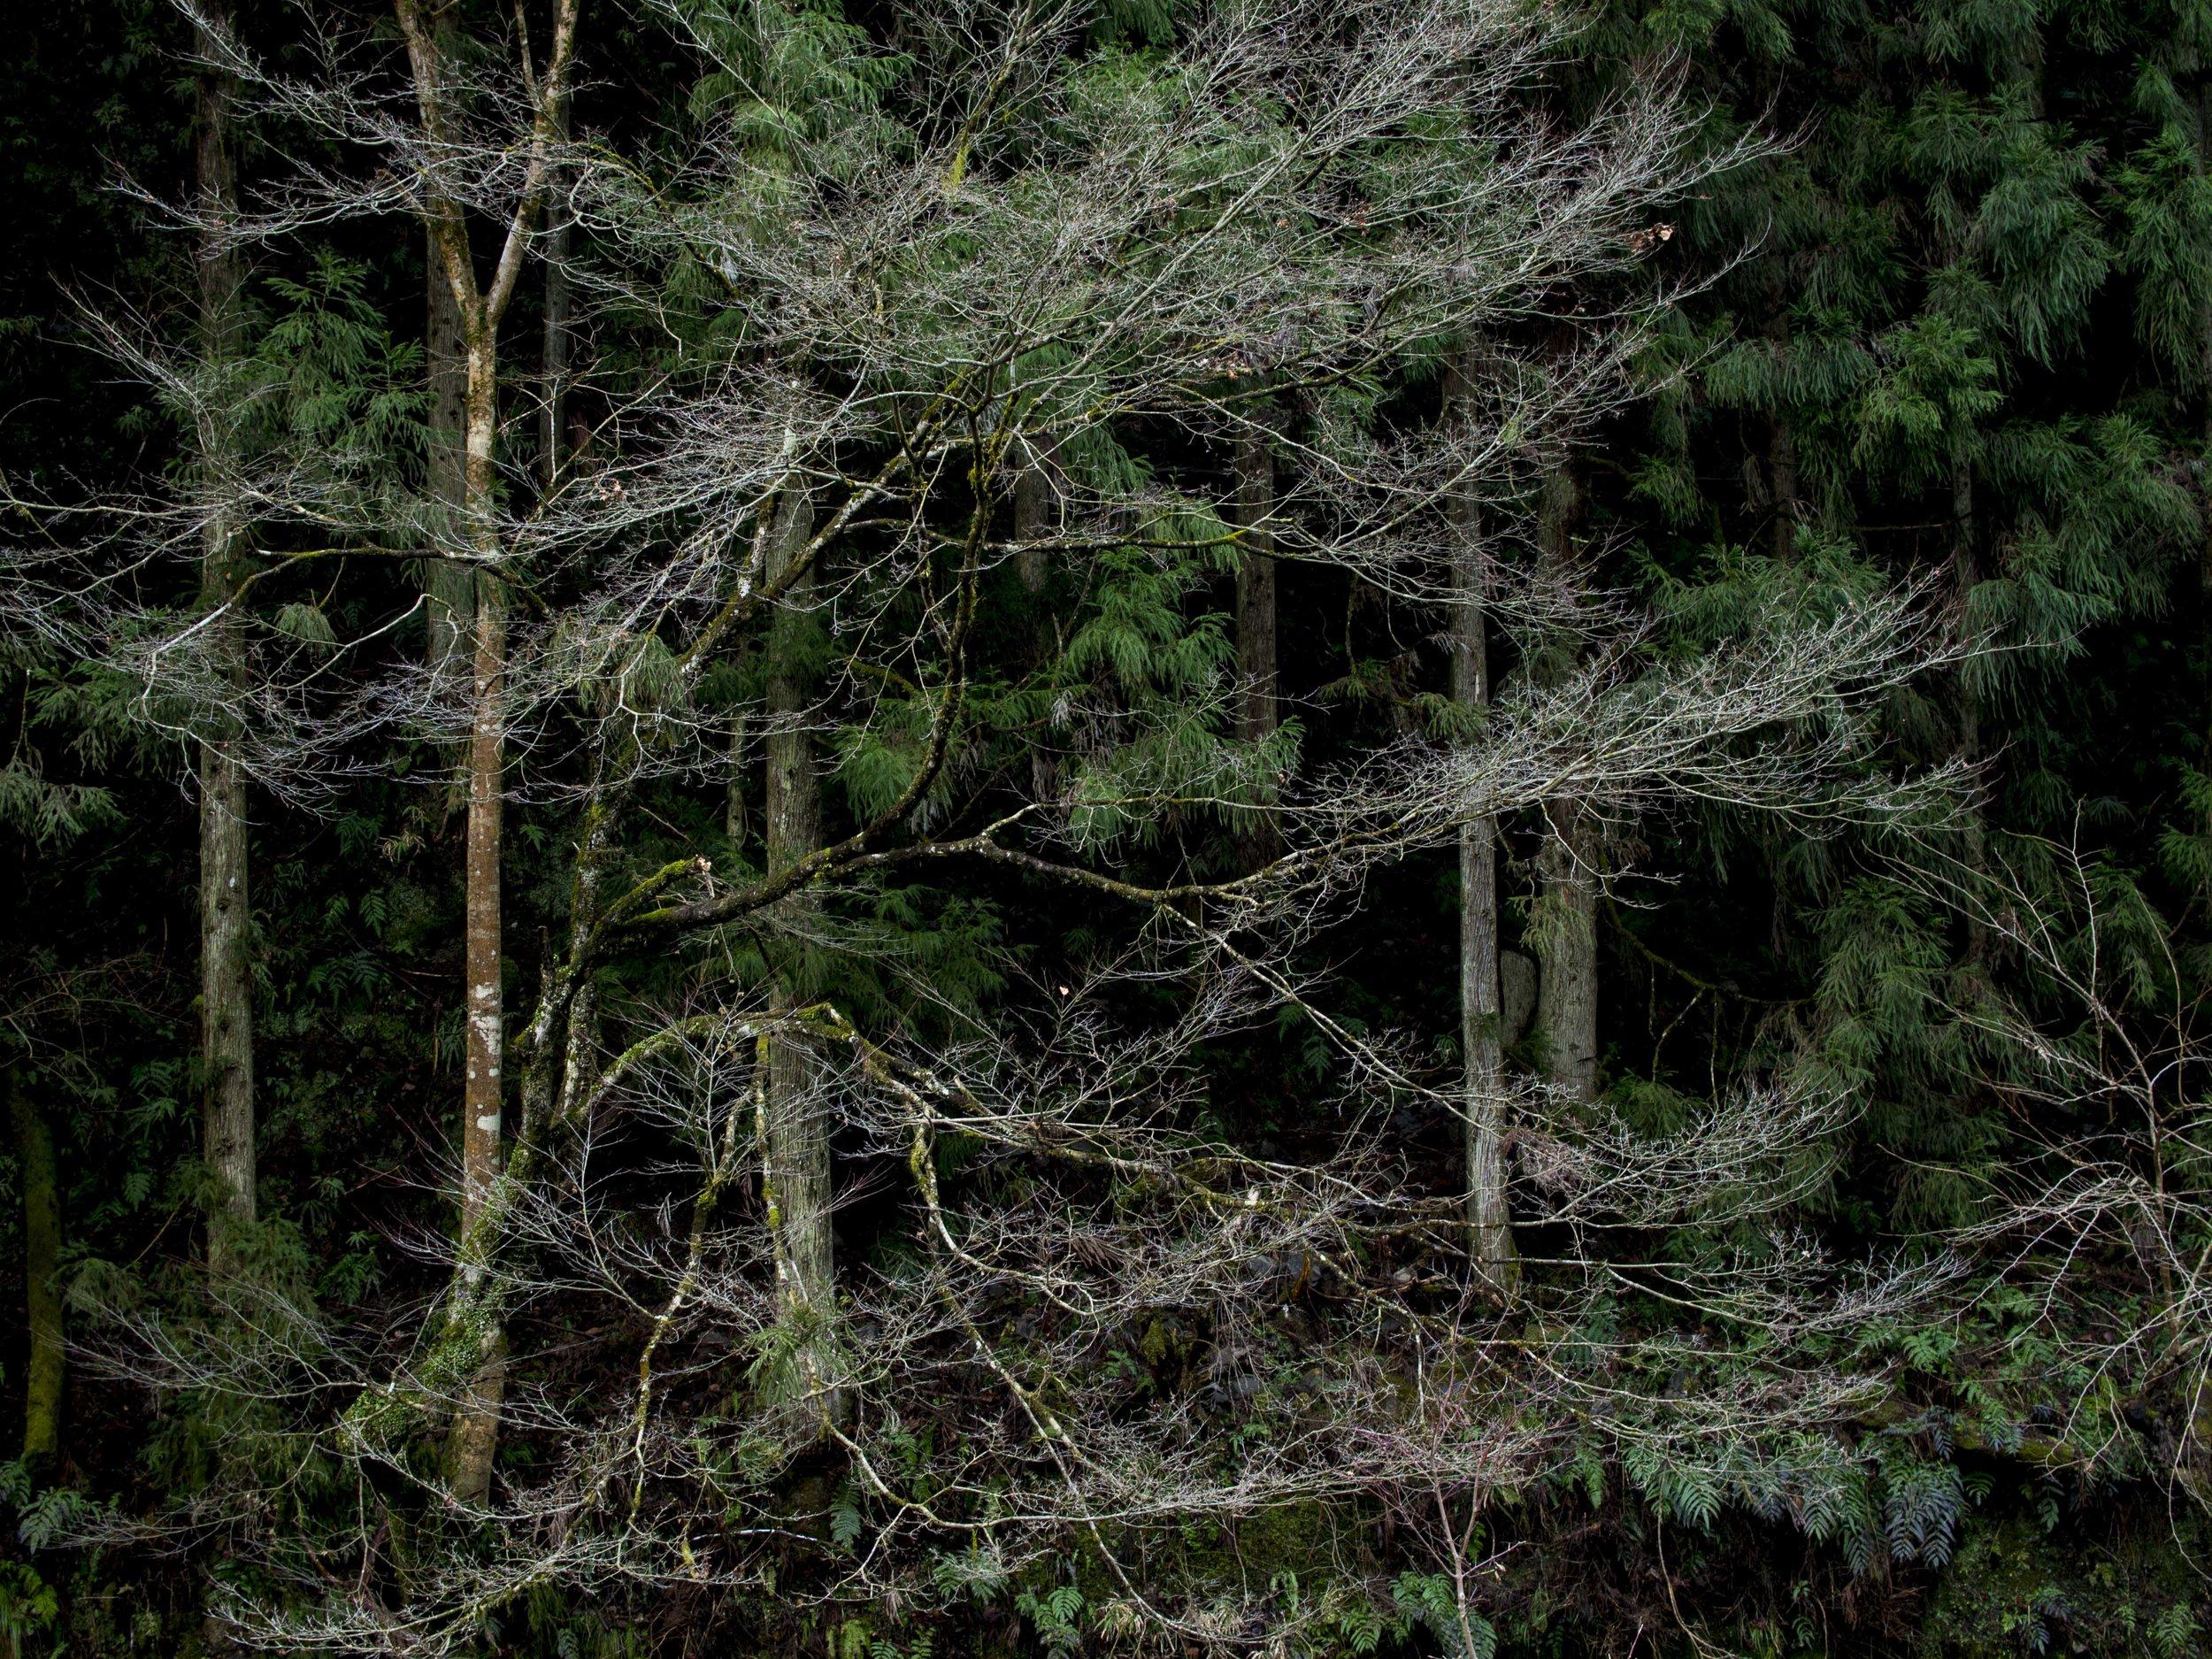 The Philosopher's trail Kyoto. EM5 25mm lens